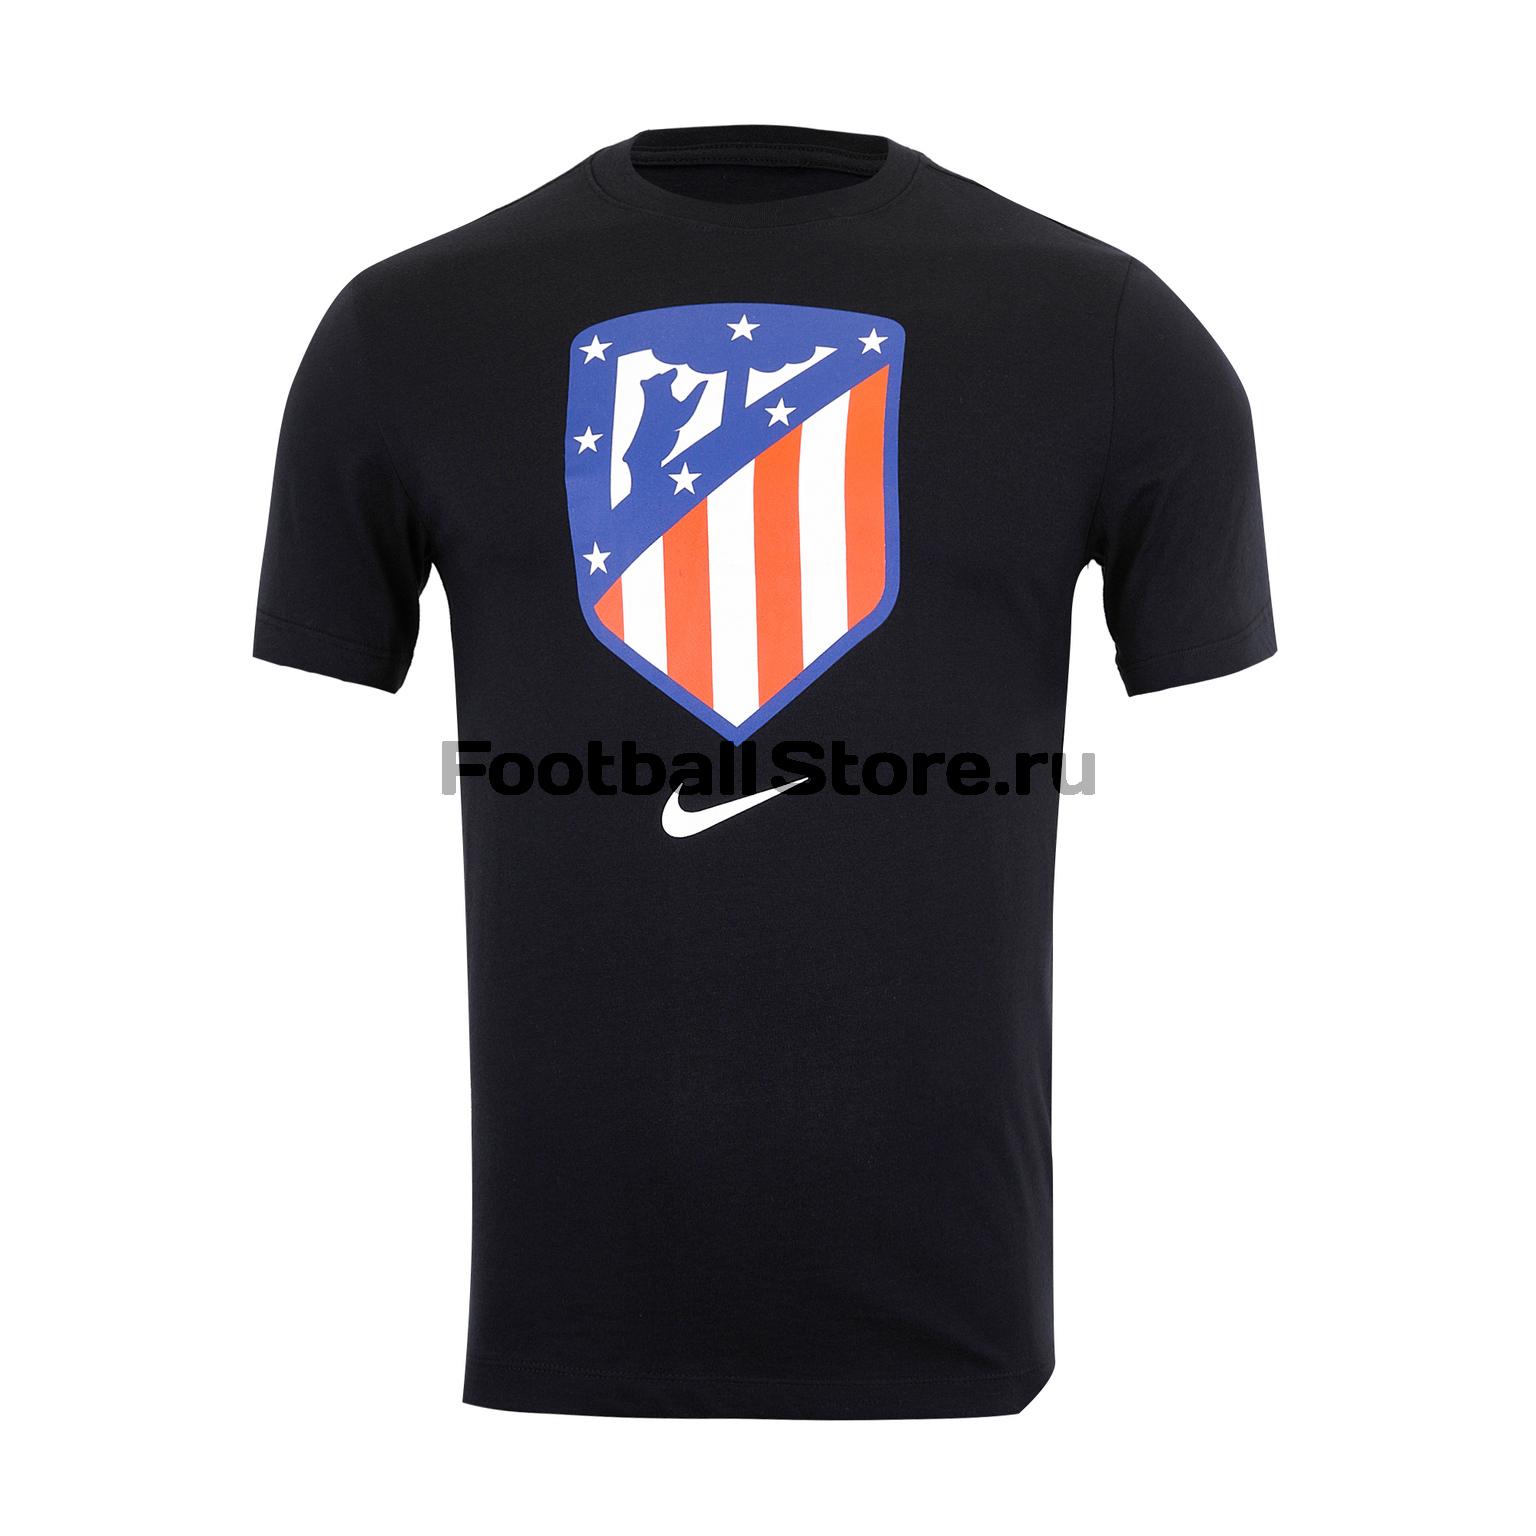 цена на Футболка хлопковая Nike Atletico Madrid AQ7450-010